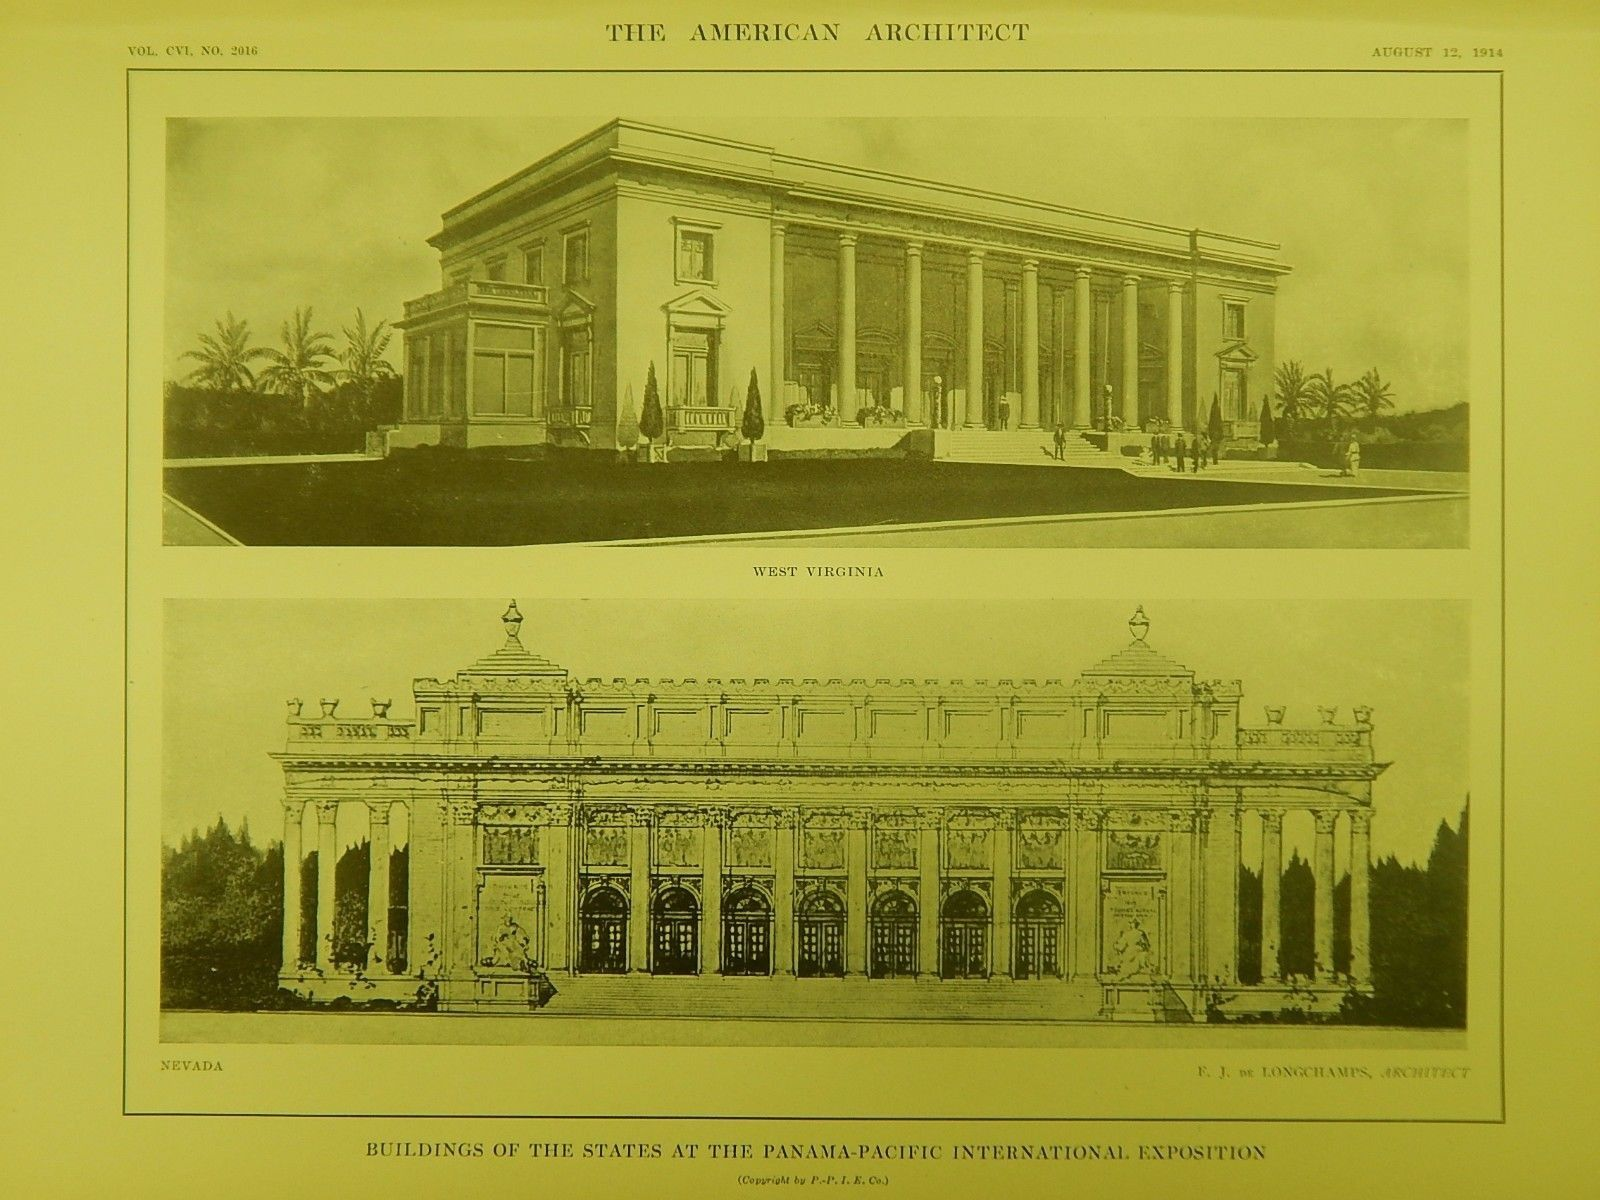 WV & Nevada Buildings, Panama-Pacific Exposition, San Francisco, CA, 1914, Original Plan. F. J. de Longchamps